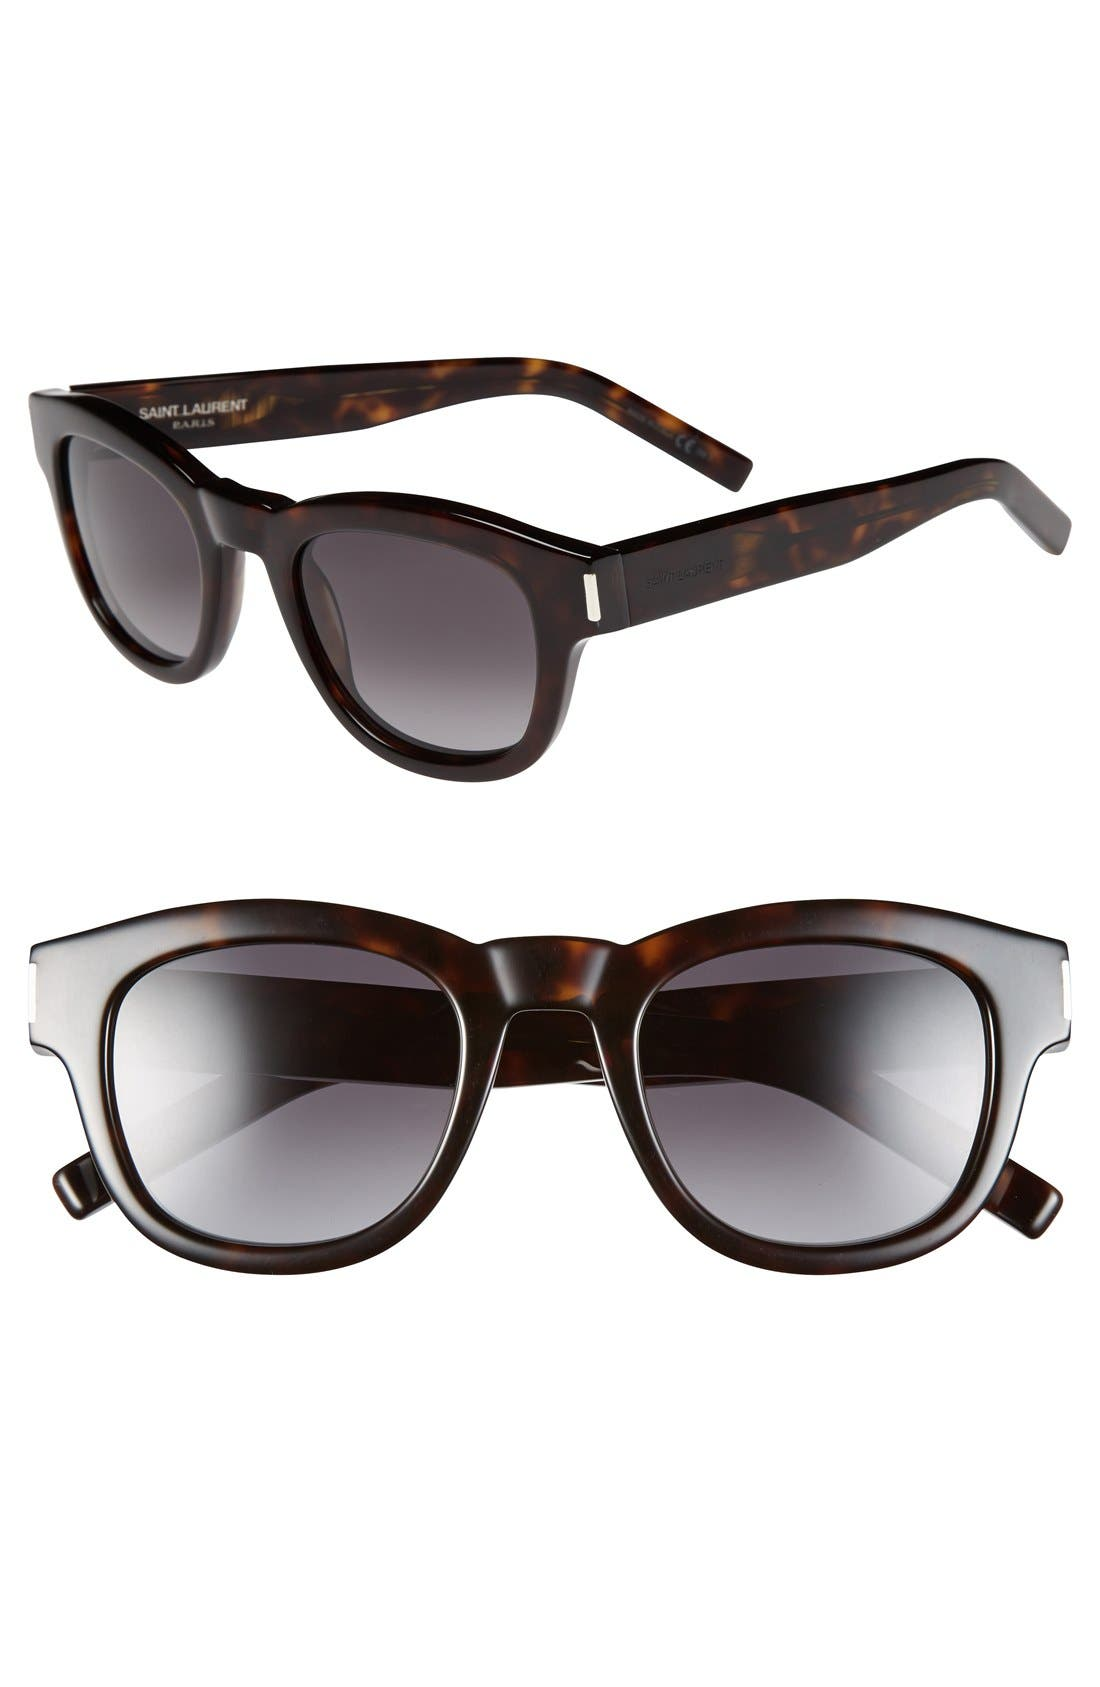 Alternate Image 1 Selected - Saint Laurent 49mm Retro Sunglasses